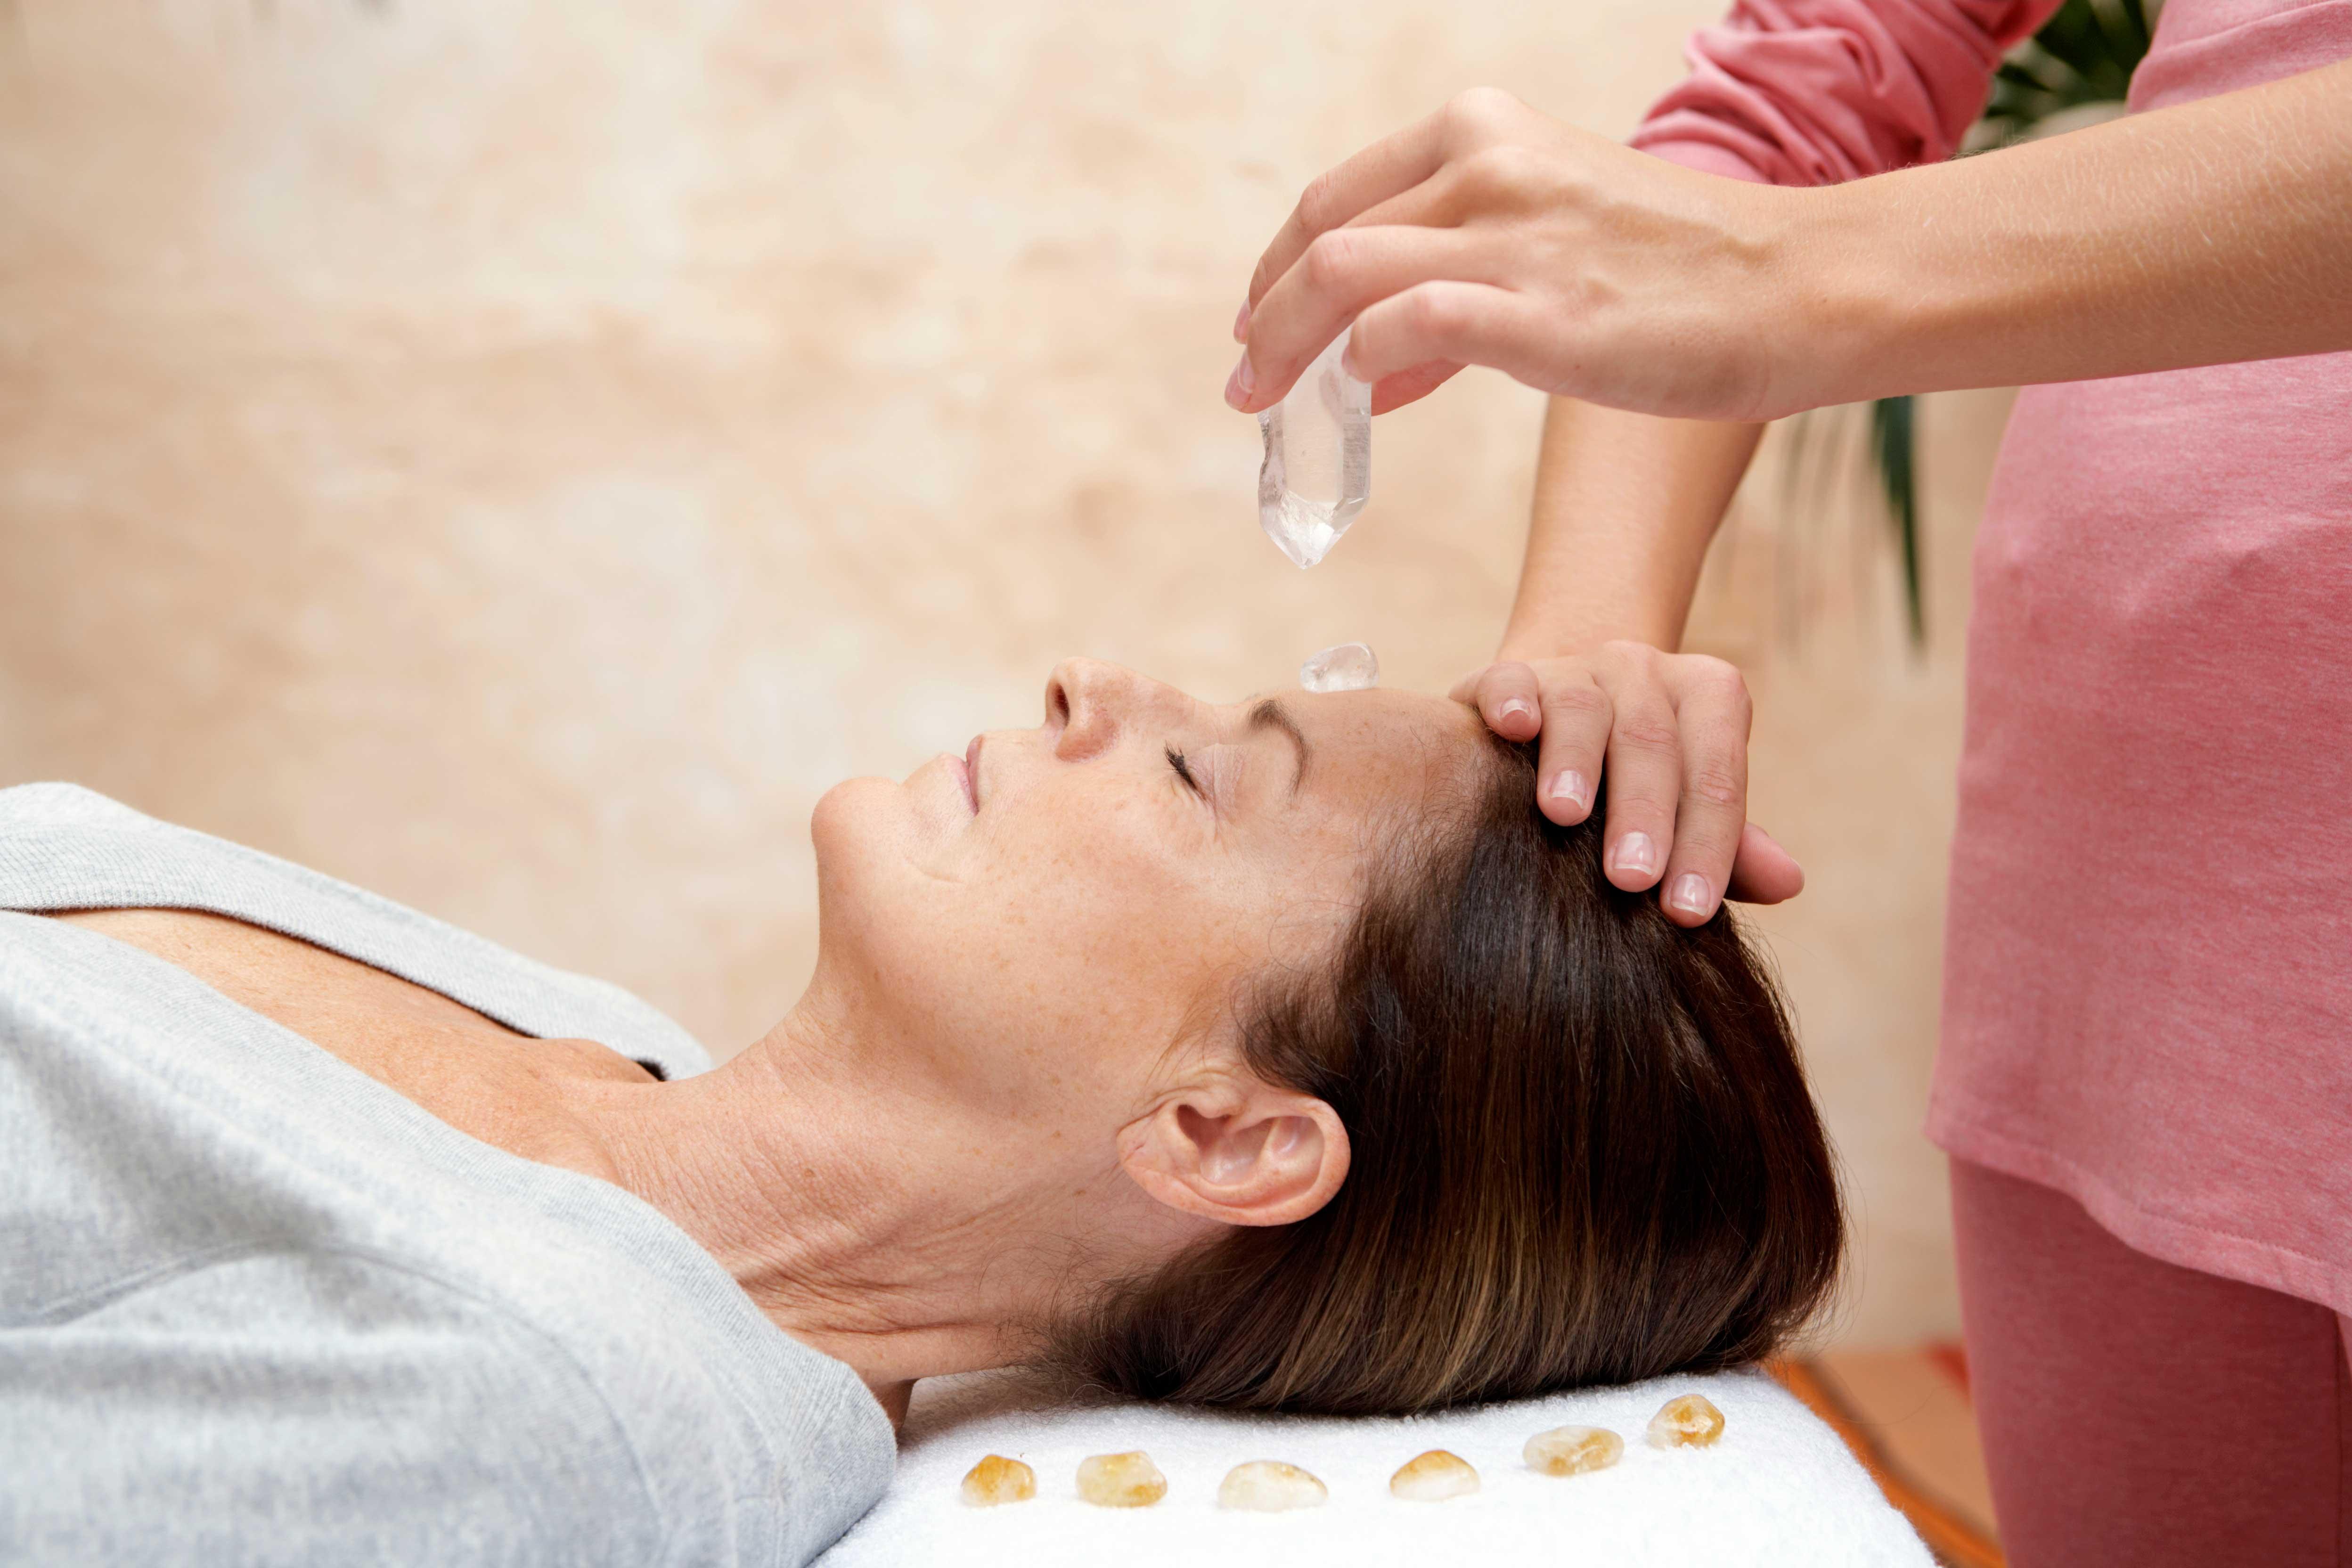 Crystal-Healing at Med Massage Wellness Clinic